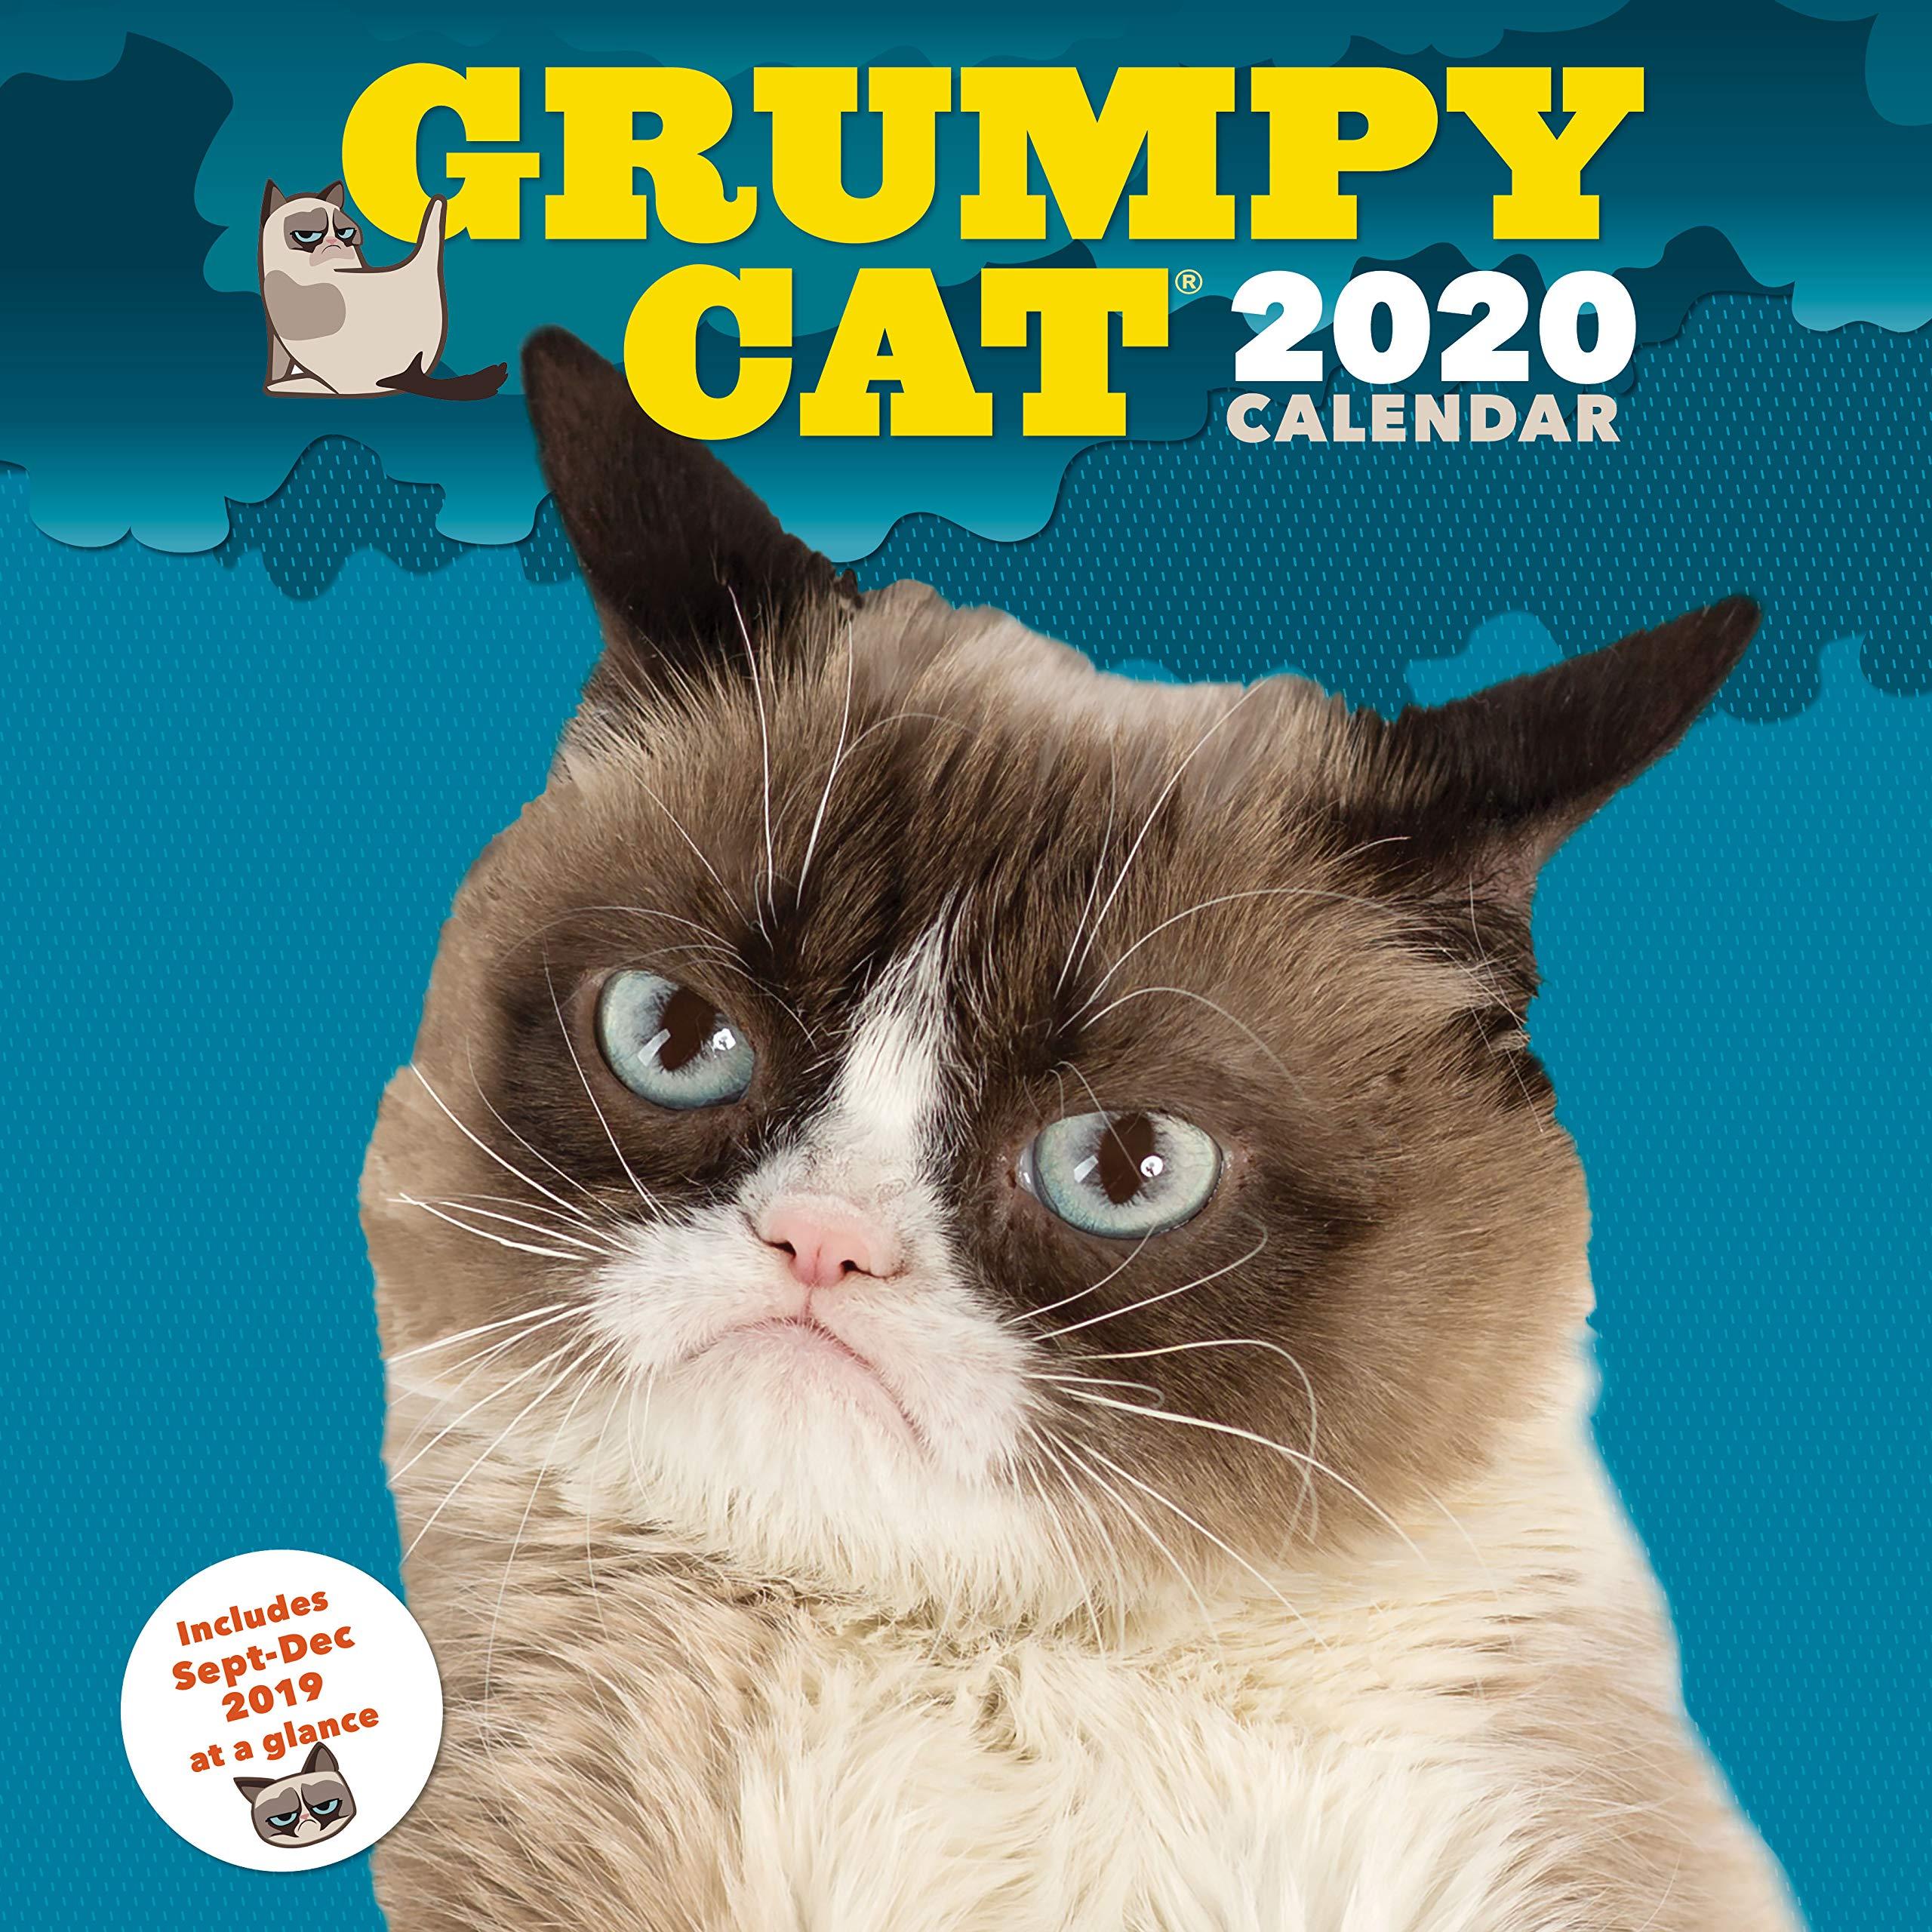 Grumpy Cat 2020 Calendar